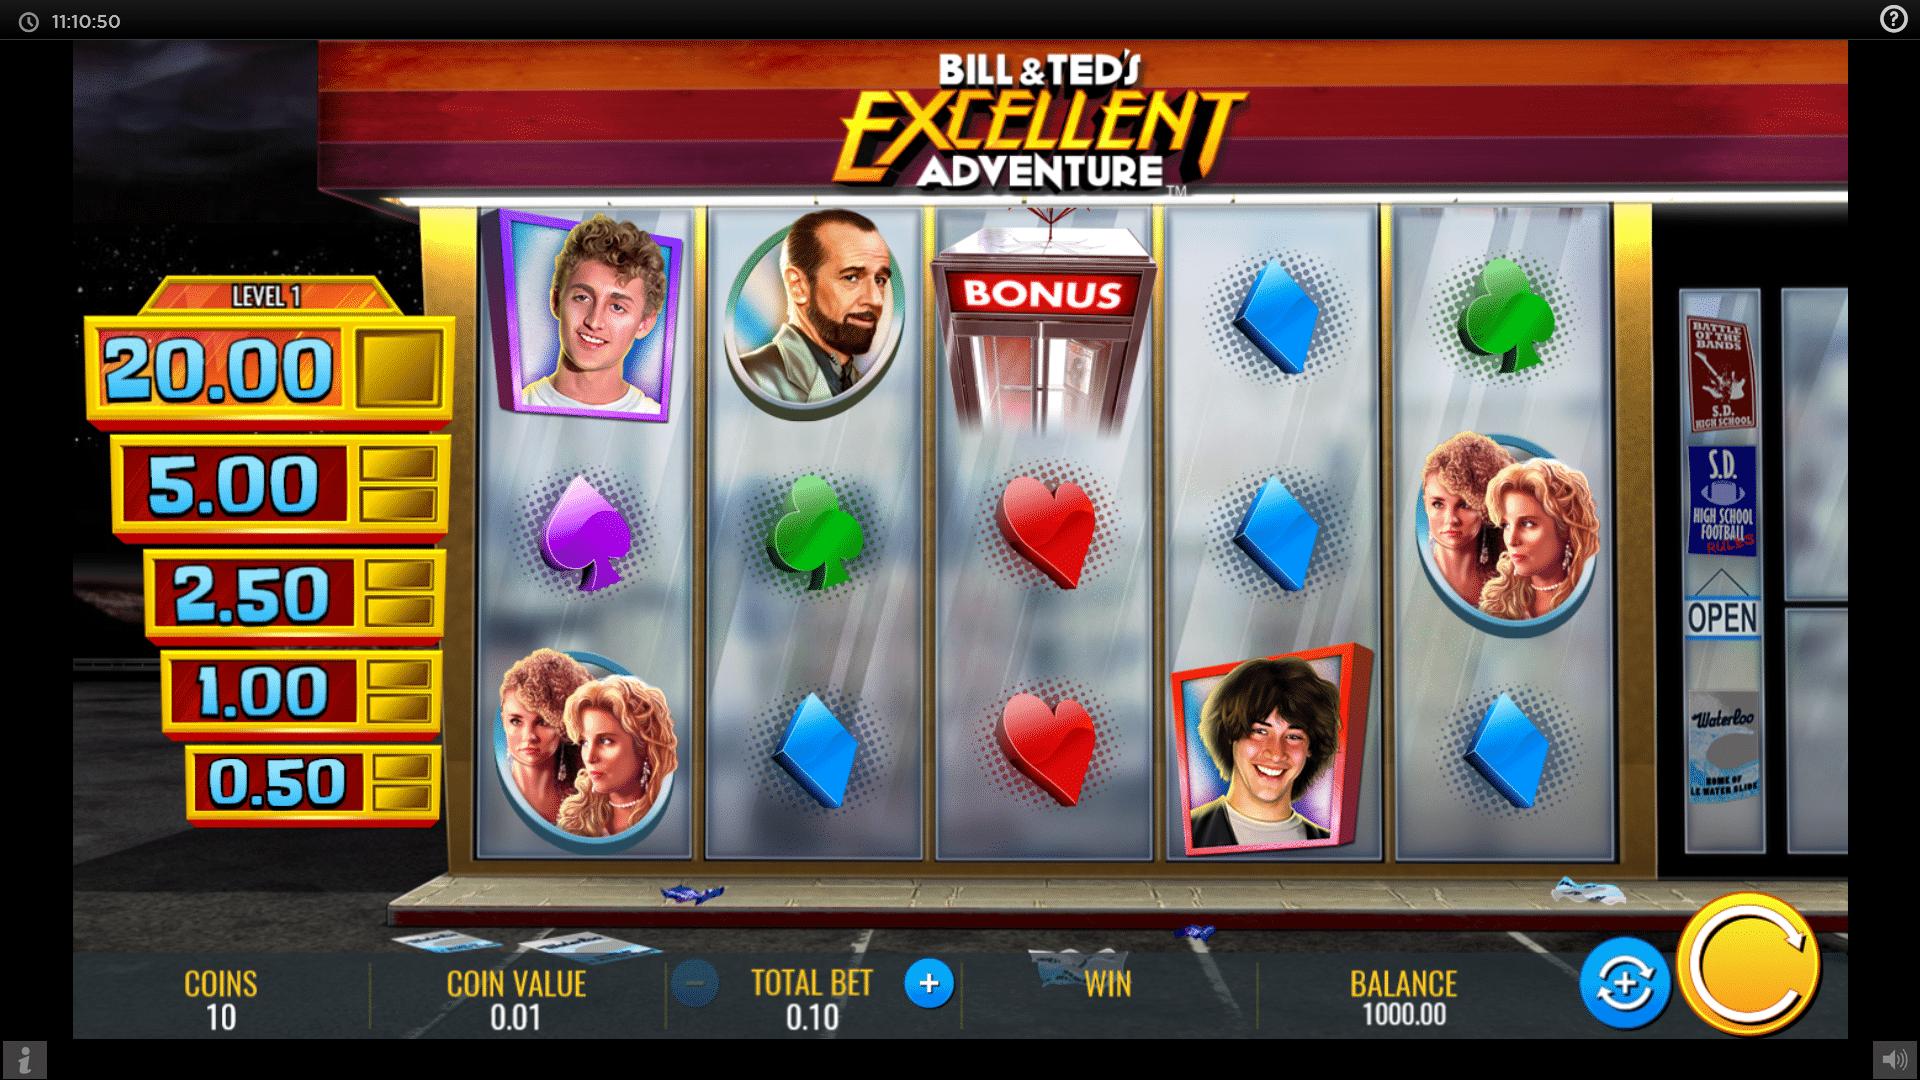 Slot Bill & Teds Excellent Adventure